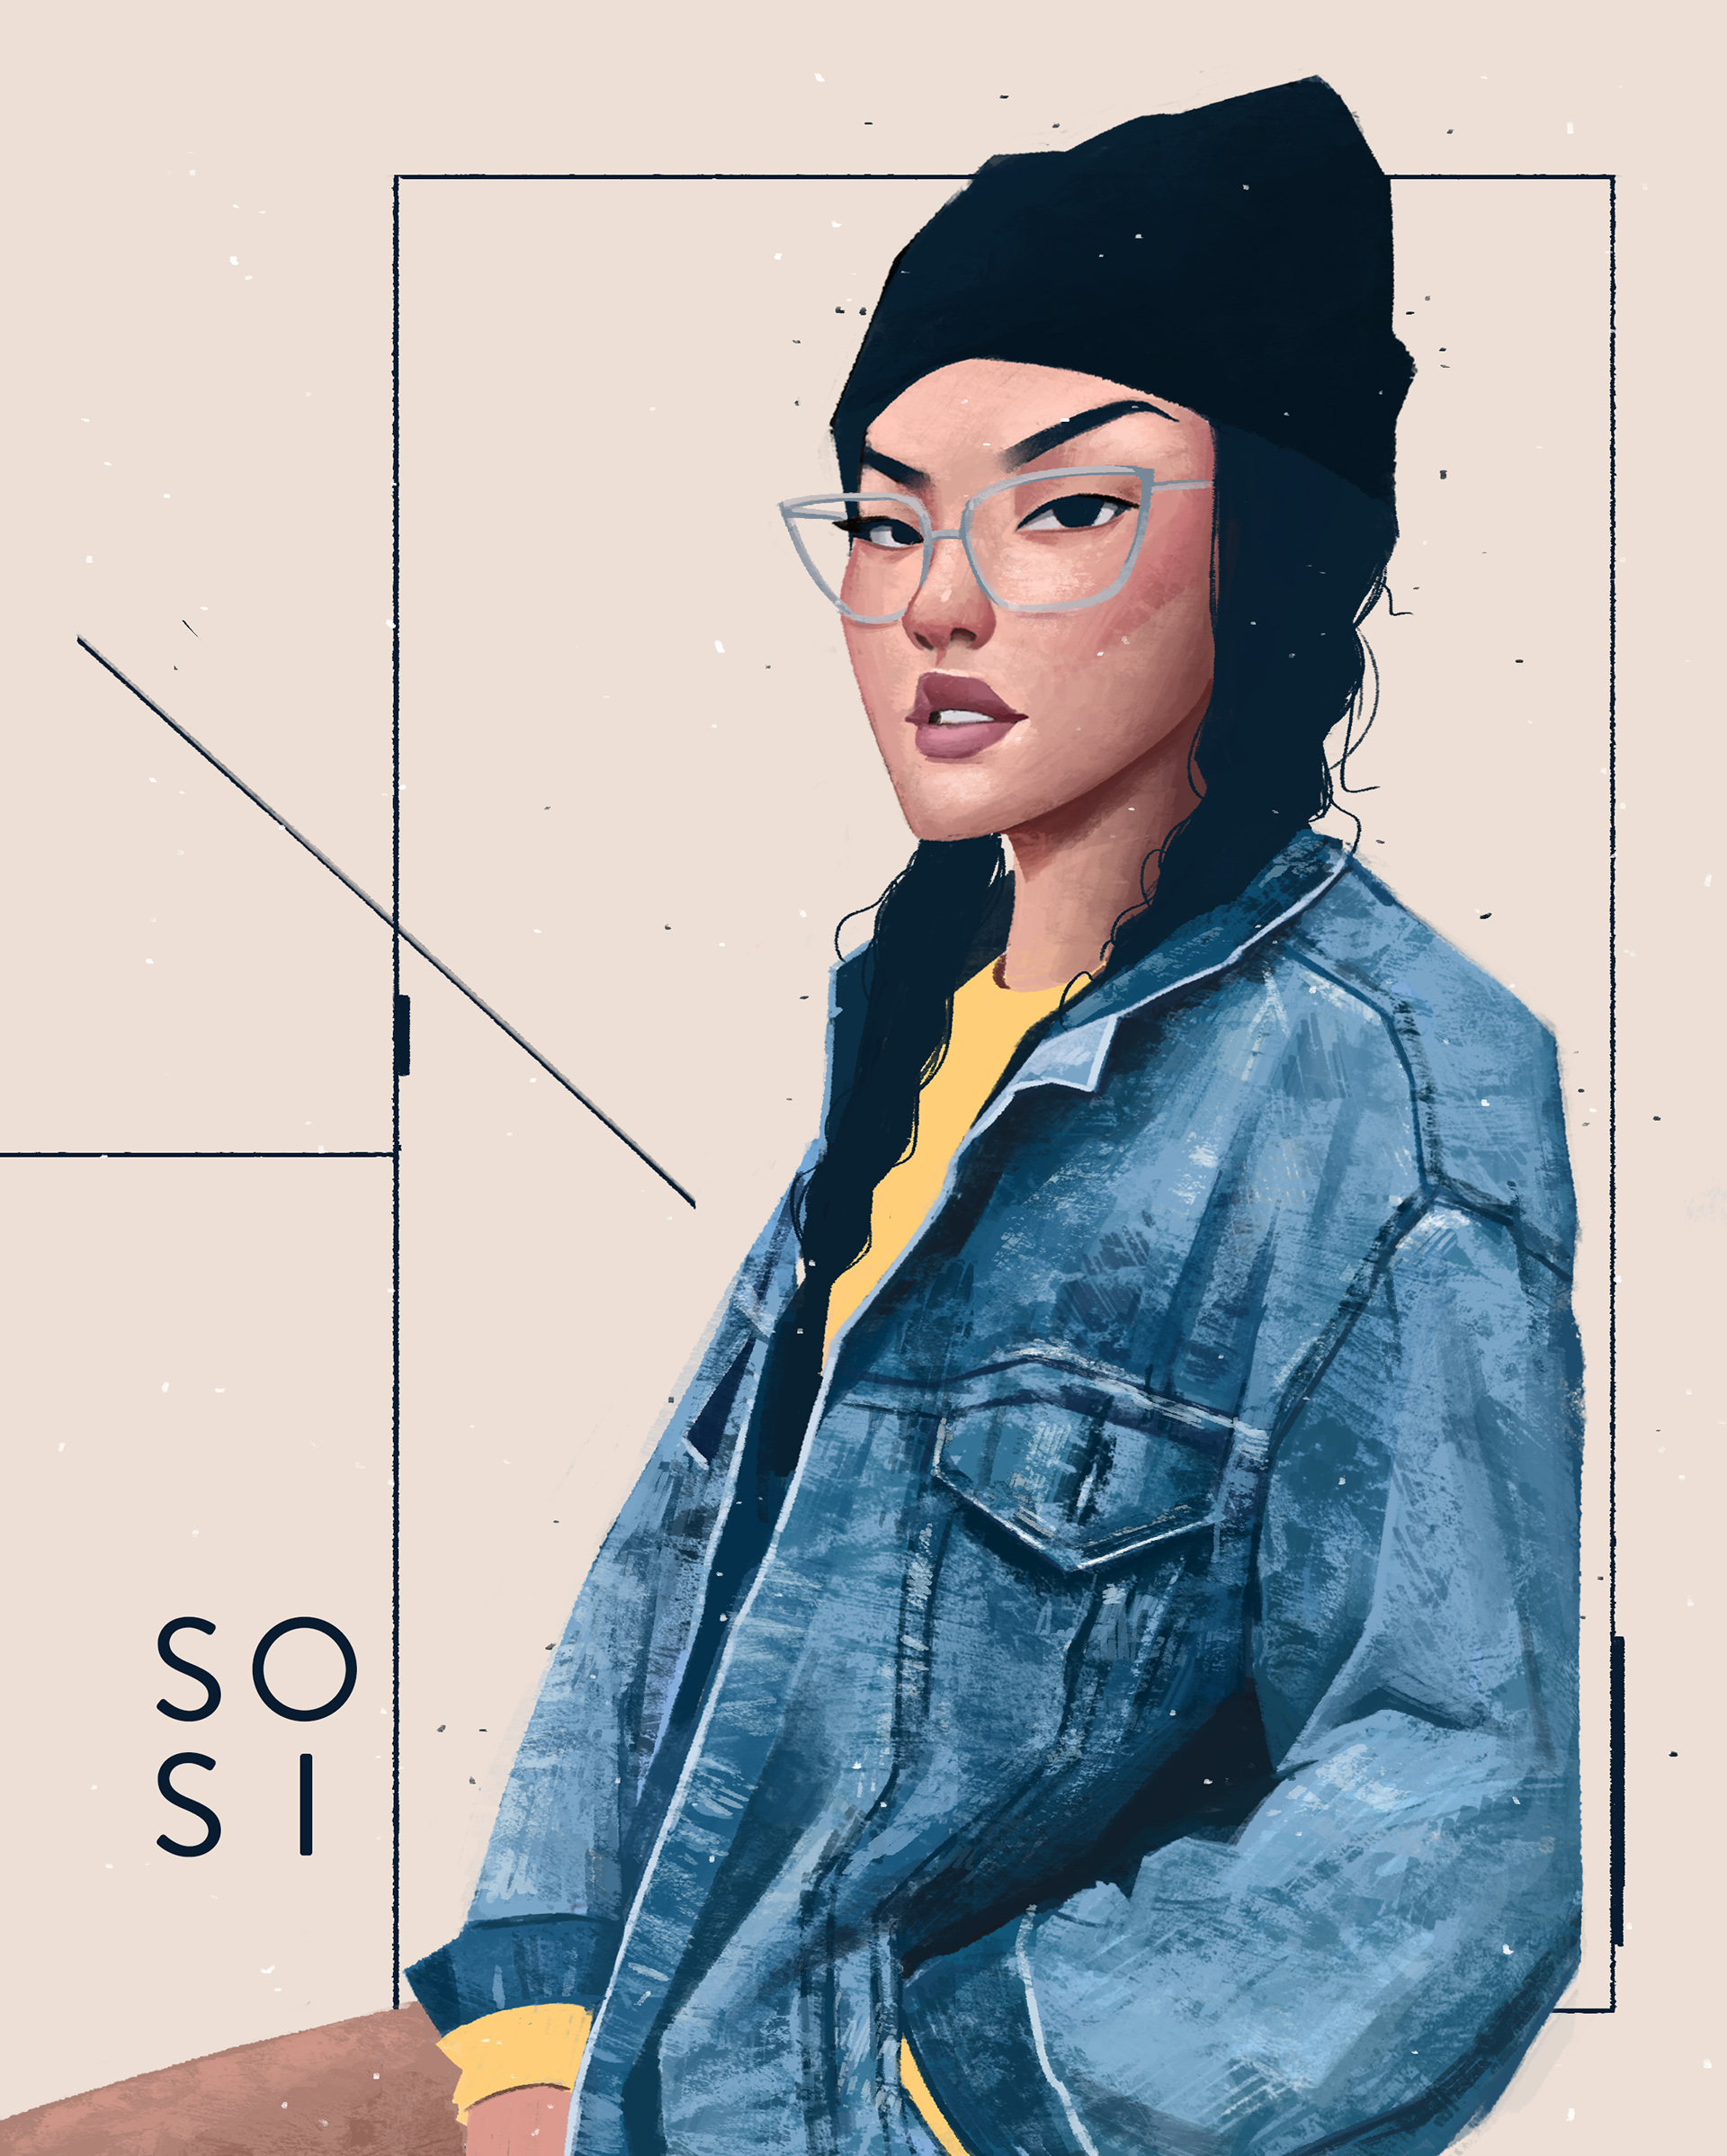 Voguish Portrait Illustrations by Janice Sung